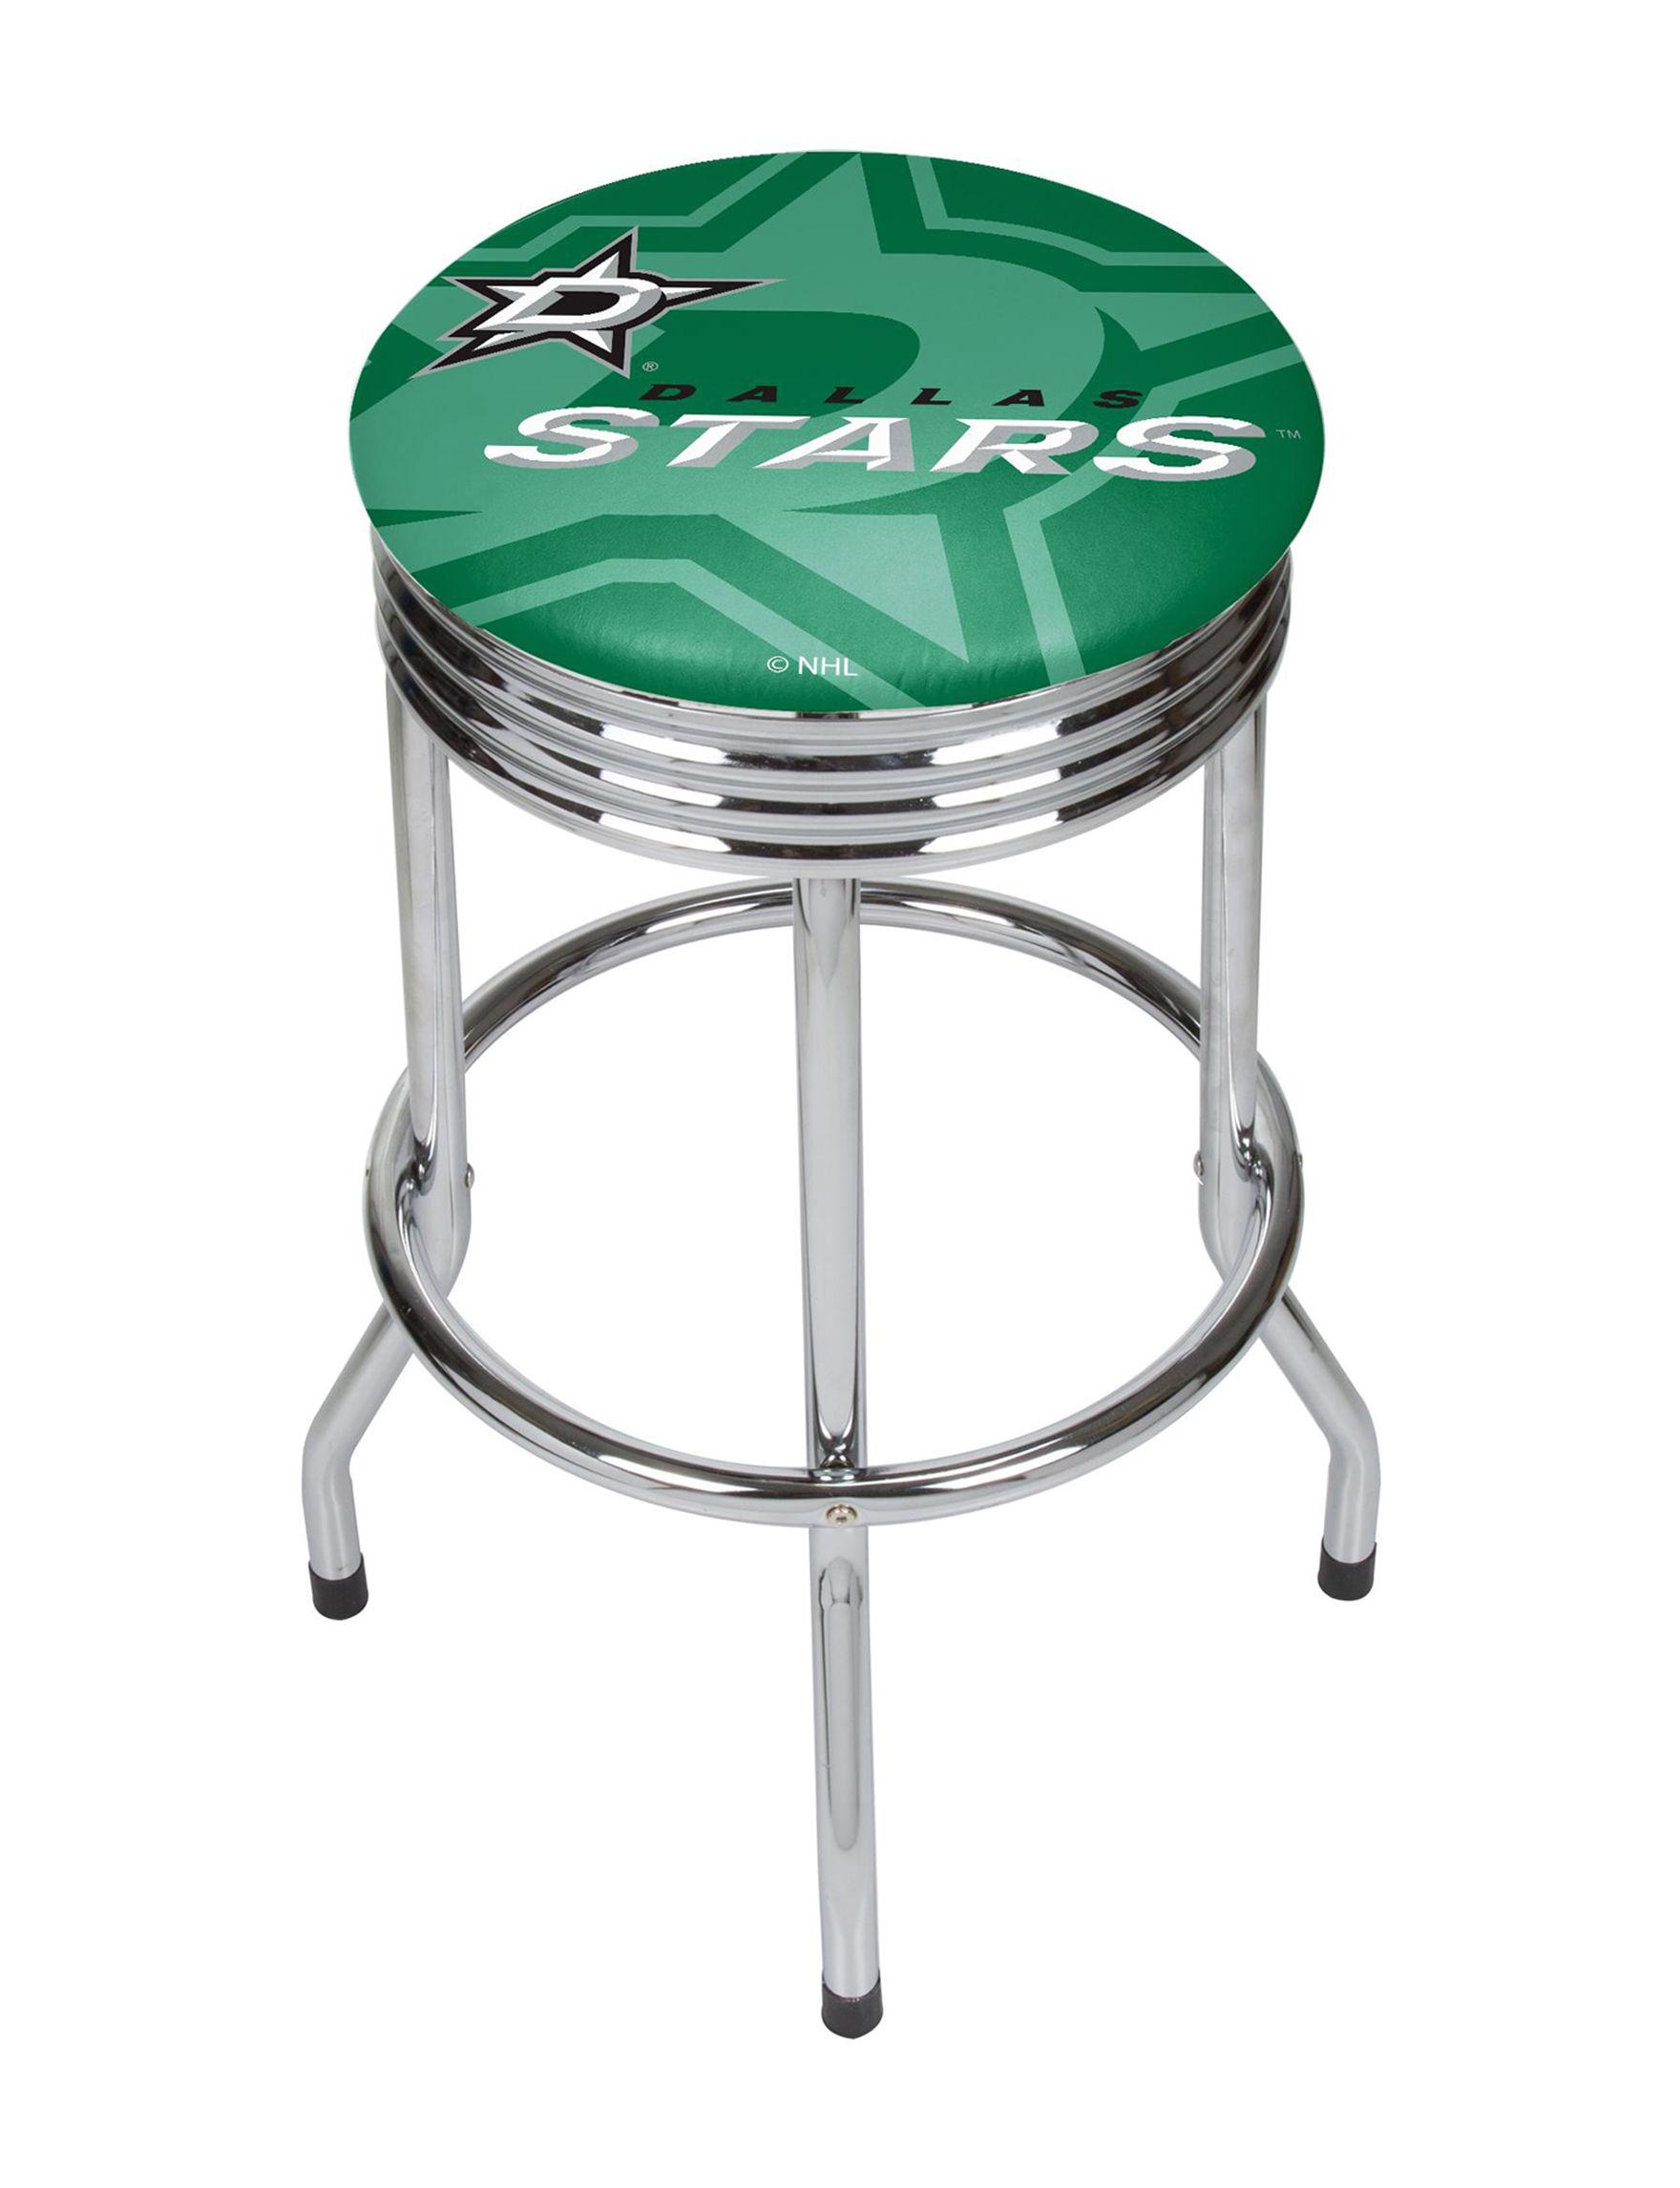 NHL Green / Black Bar & Kitchen Stools Kitchen & Dining Furniture NHL